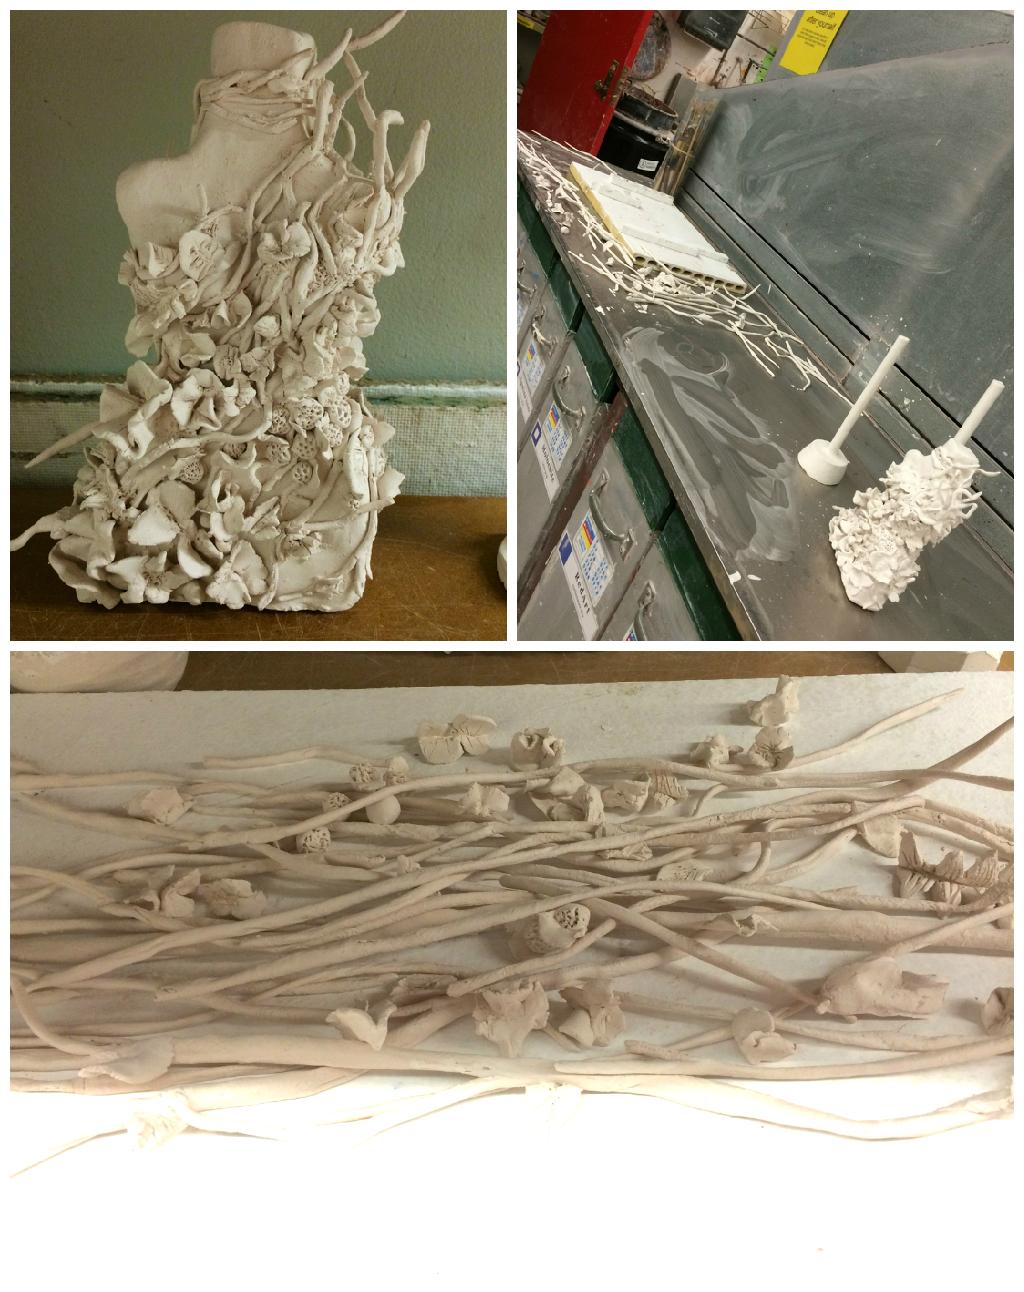 ceramics  White Nature twigs leaves beauty Fragile delicate risd